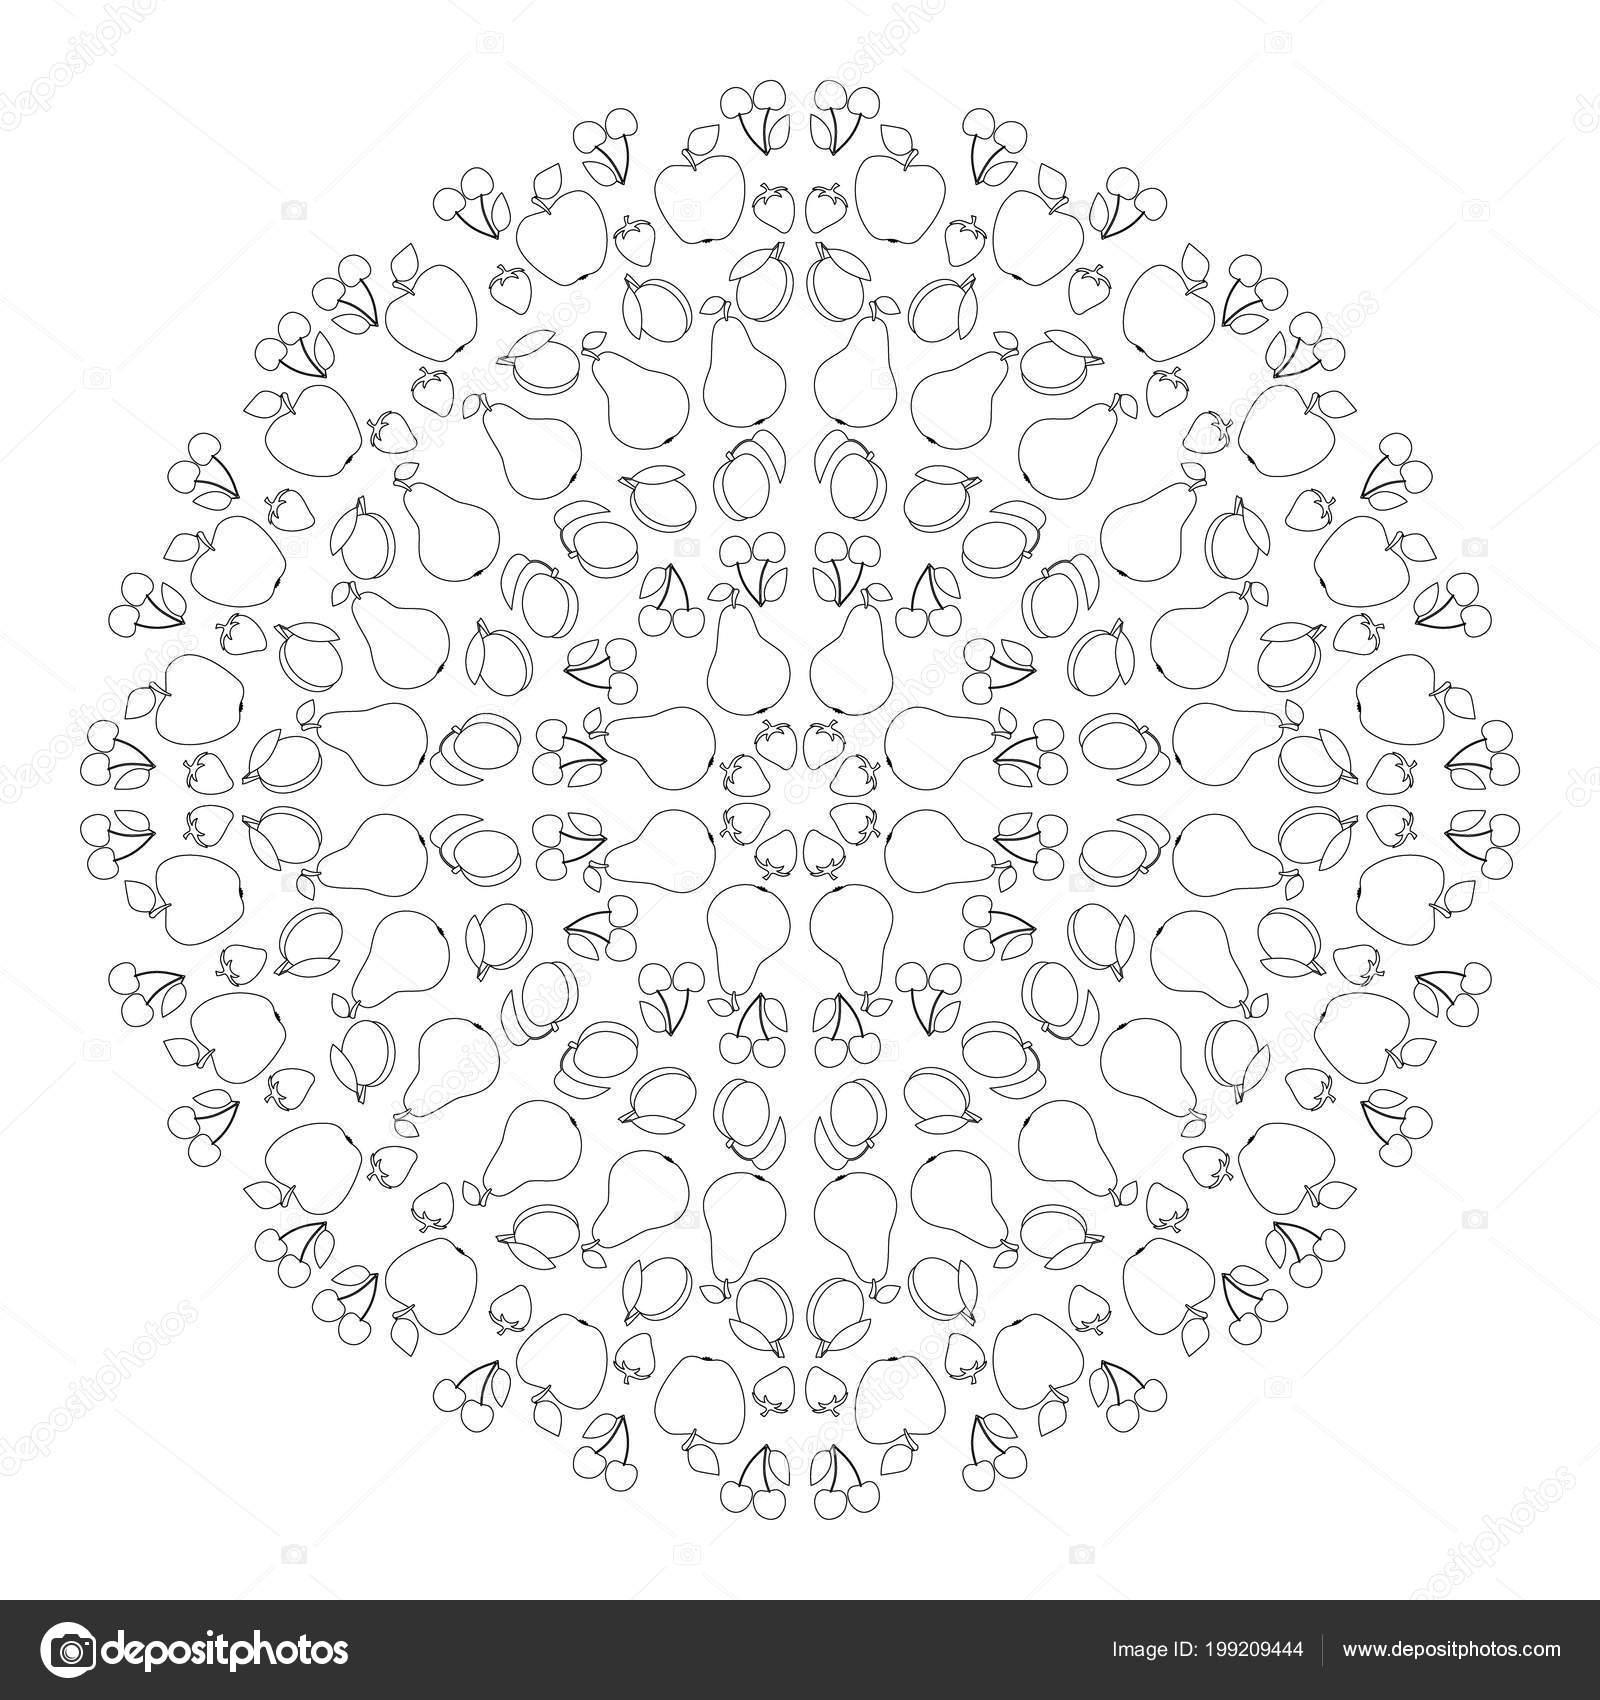 Mandala Kleurplaten Fruit.Vector Zwart Wit Circulaire Ronde Zomer Mandala Met Fruit